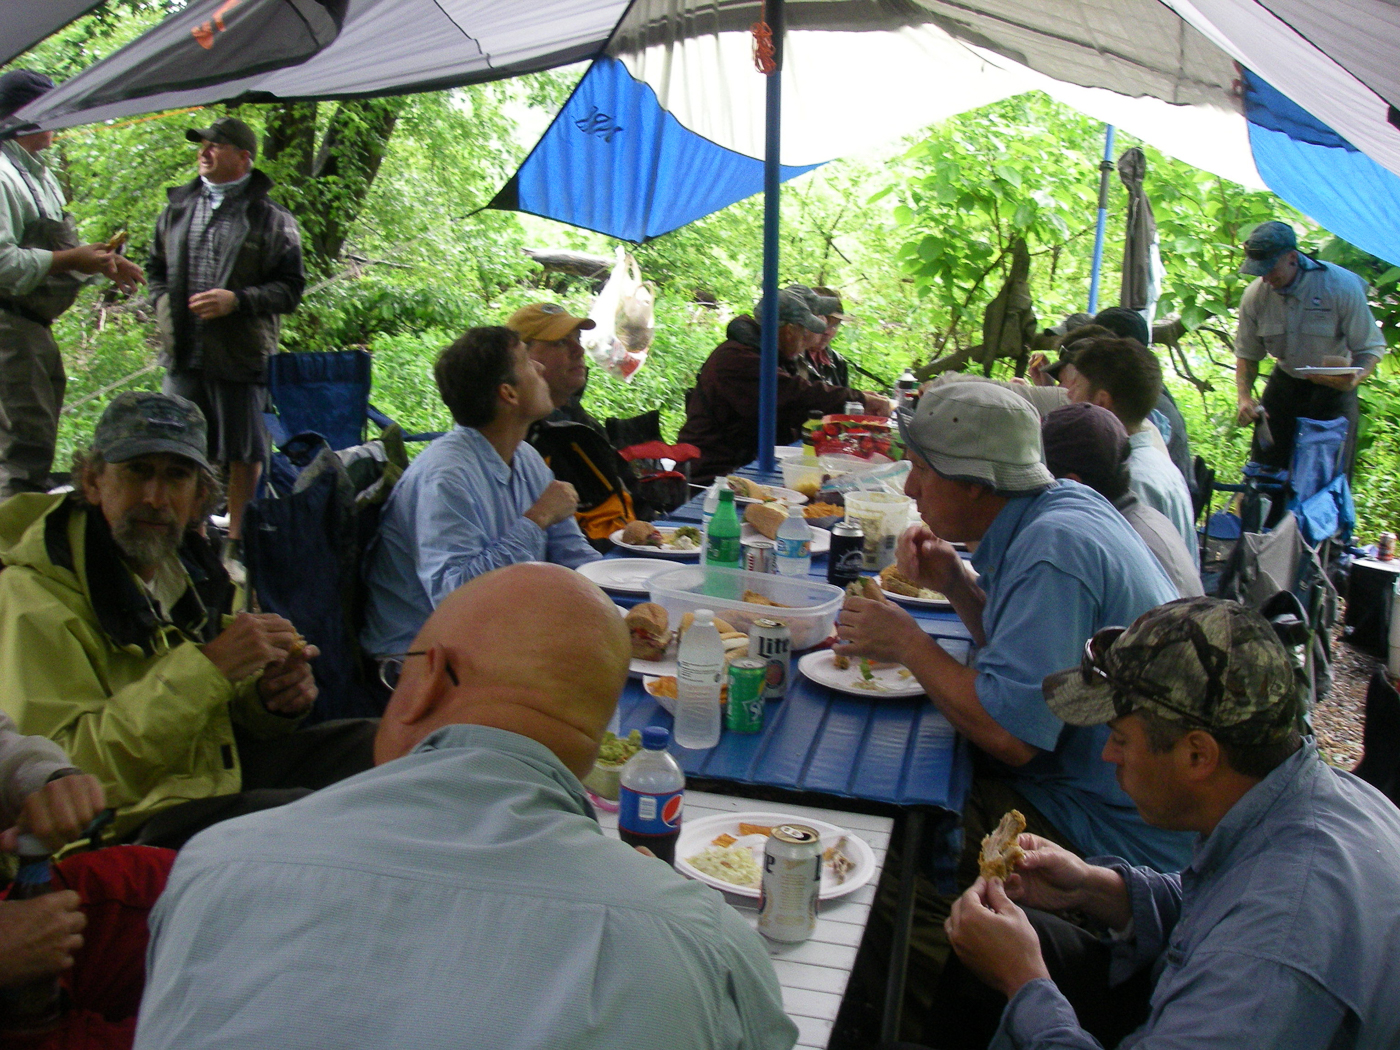 mark-kovach-fishing-services-trip-lunch-003.jpg